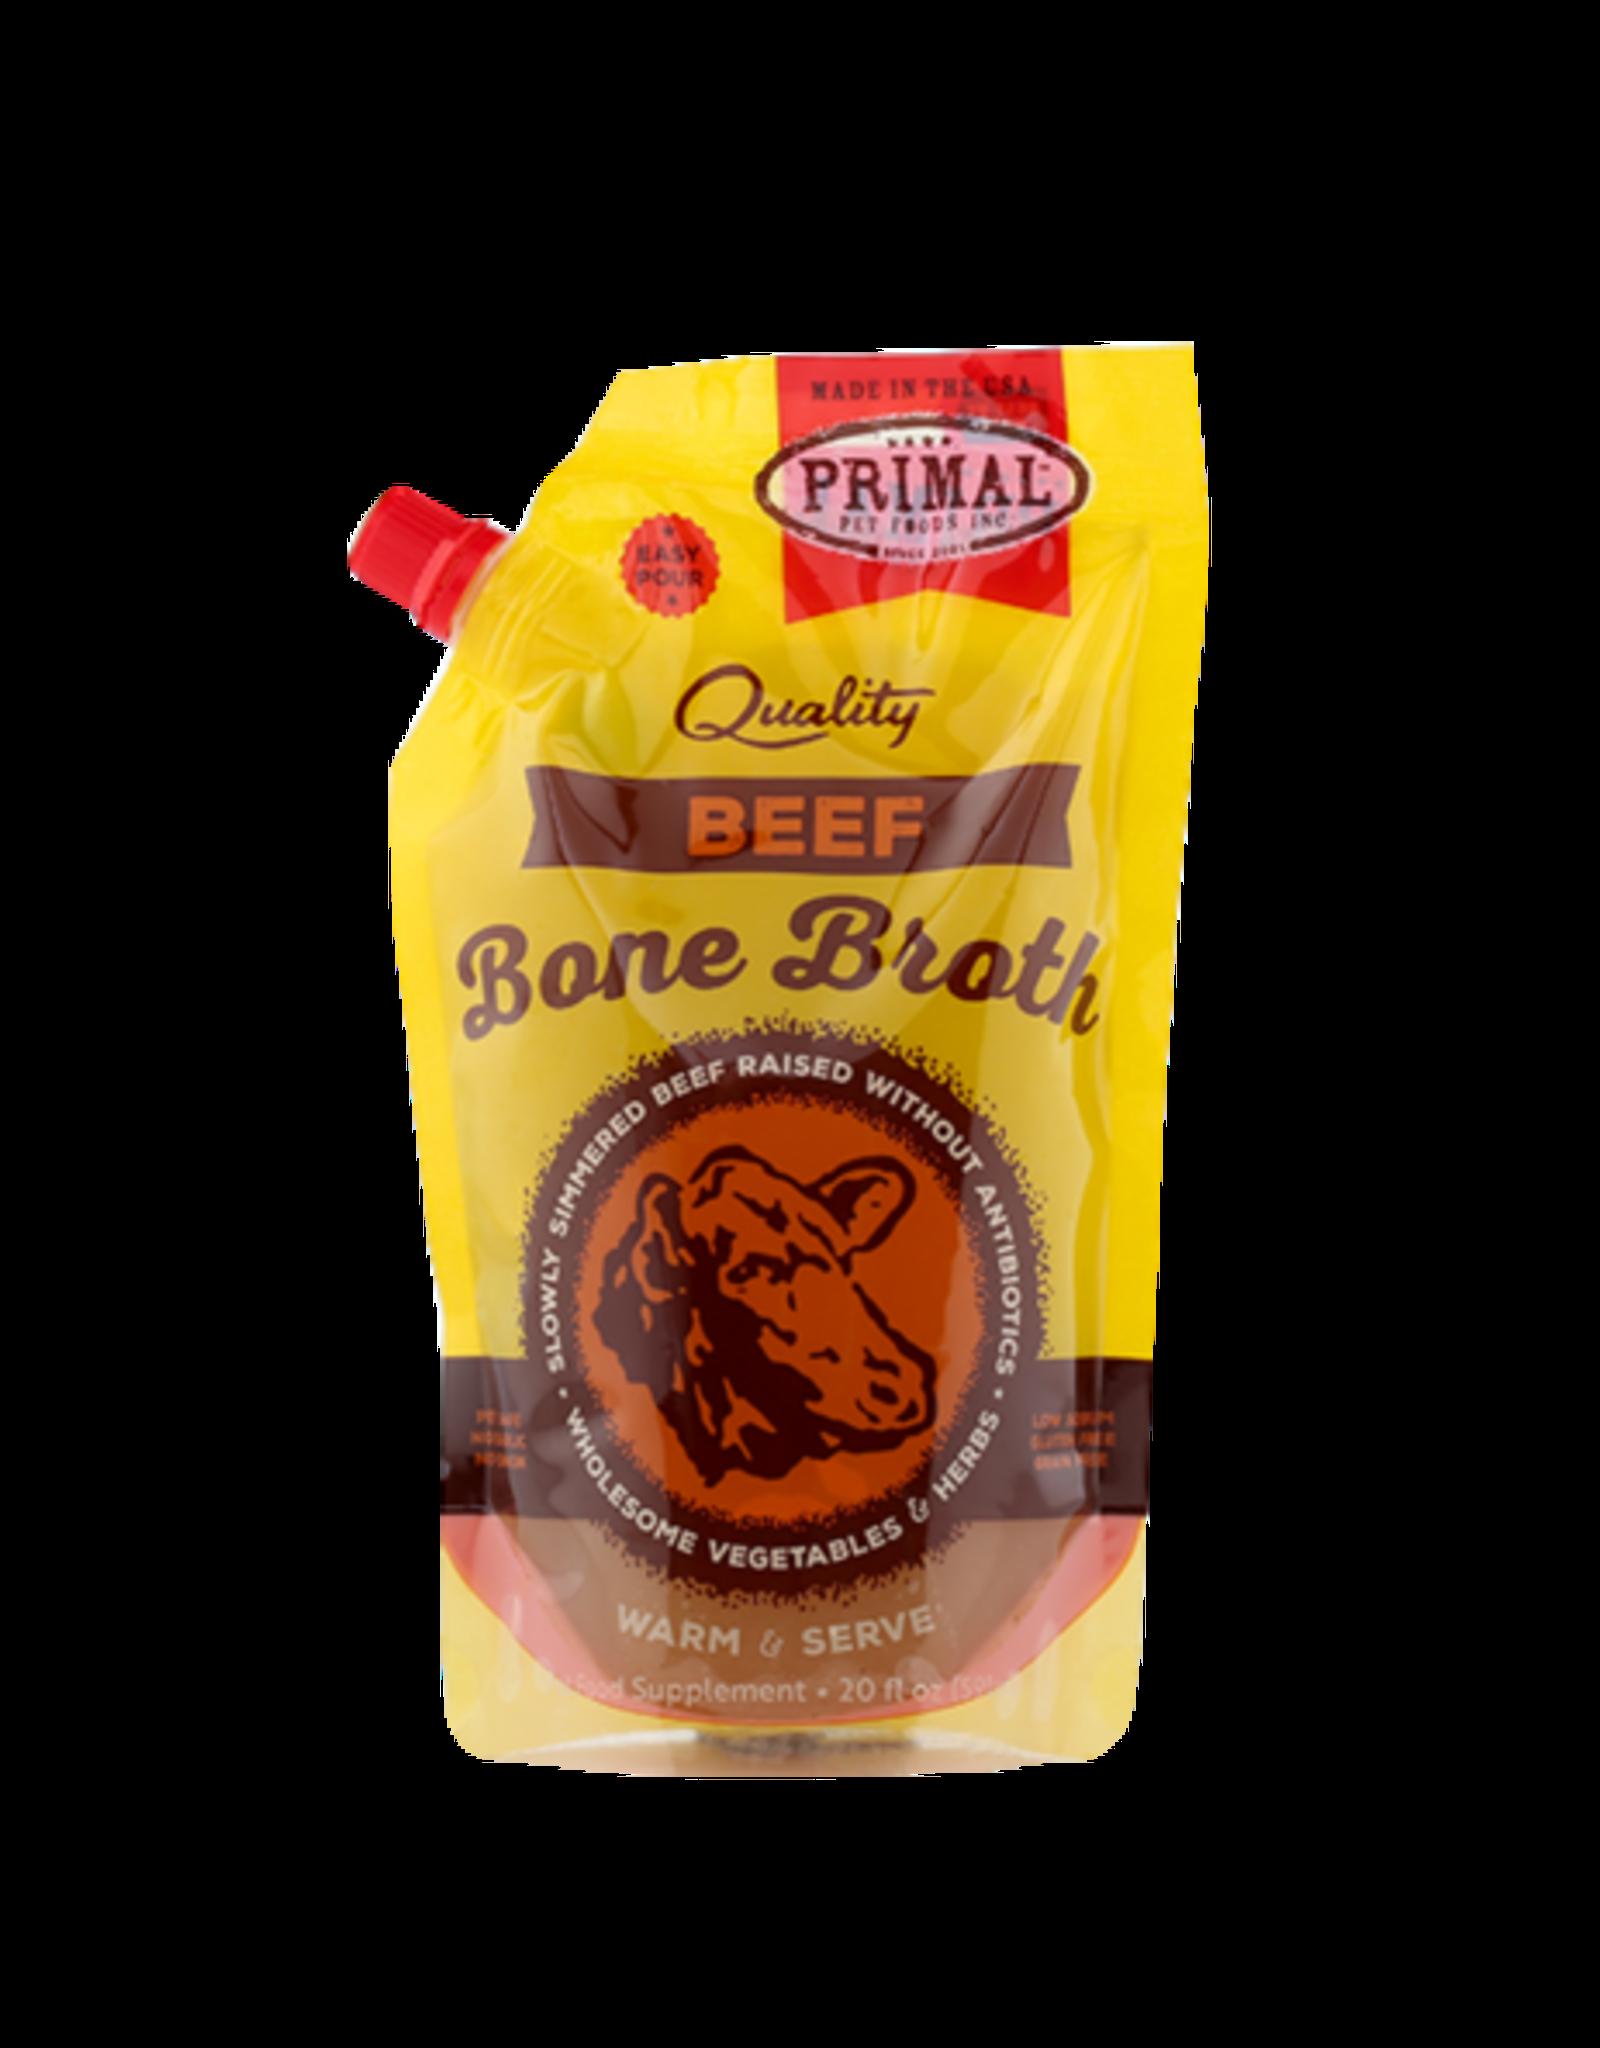 Presidio Primal Frozen Bone Broth